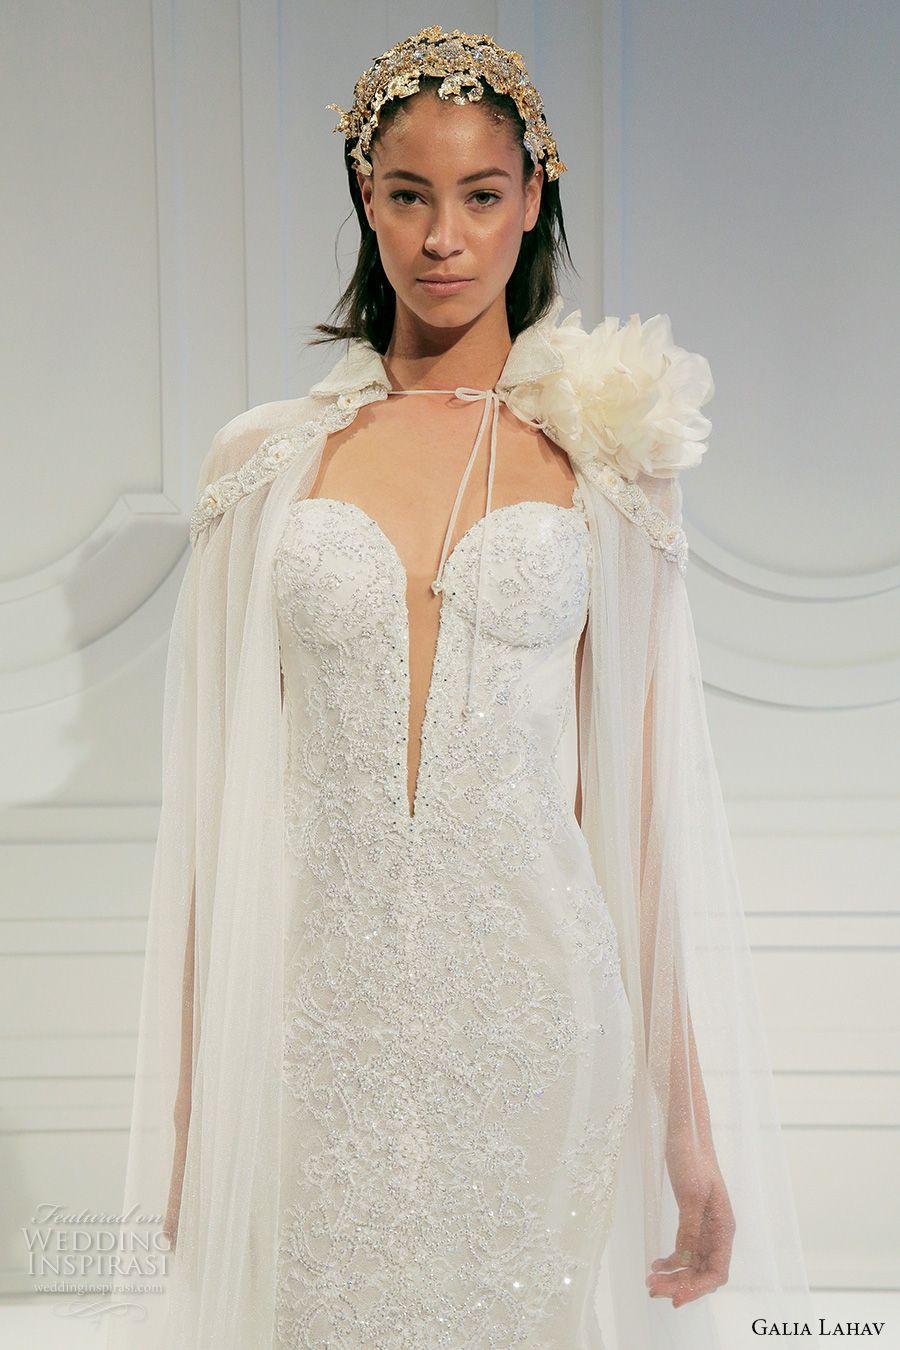 Beaded sheath wedding dress  Galia Lahav Spring  Wedding Dresses u ucLe Secret Royalud Couture